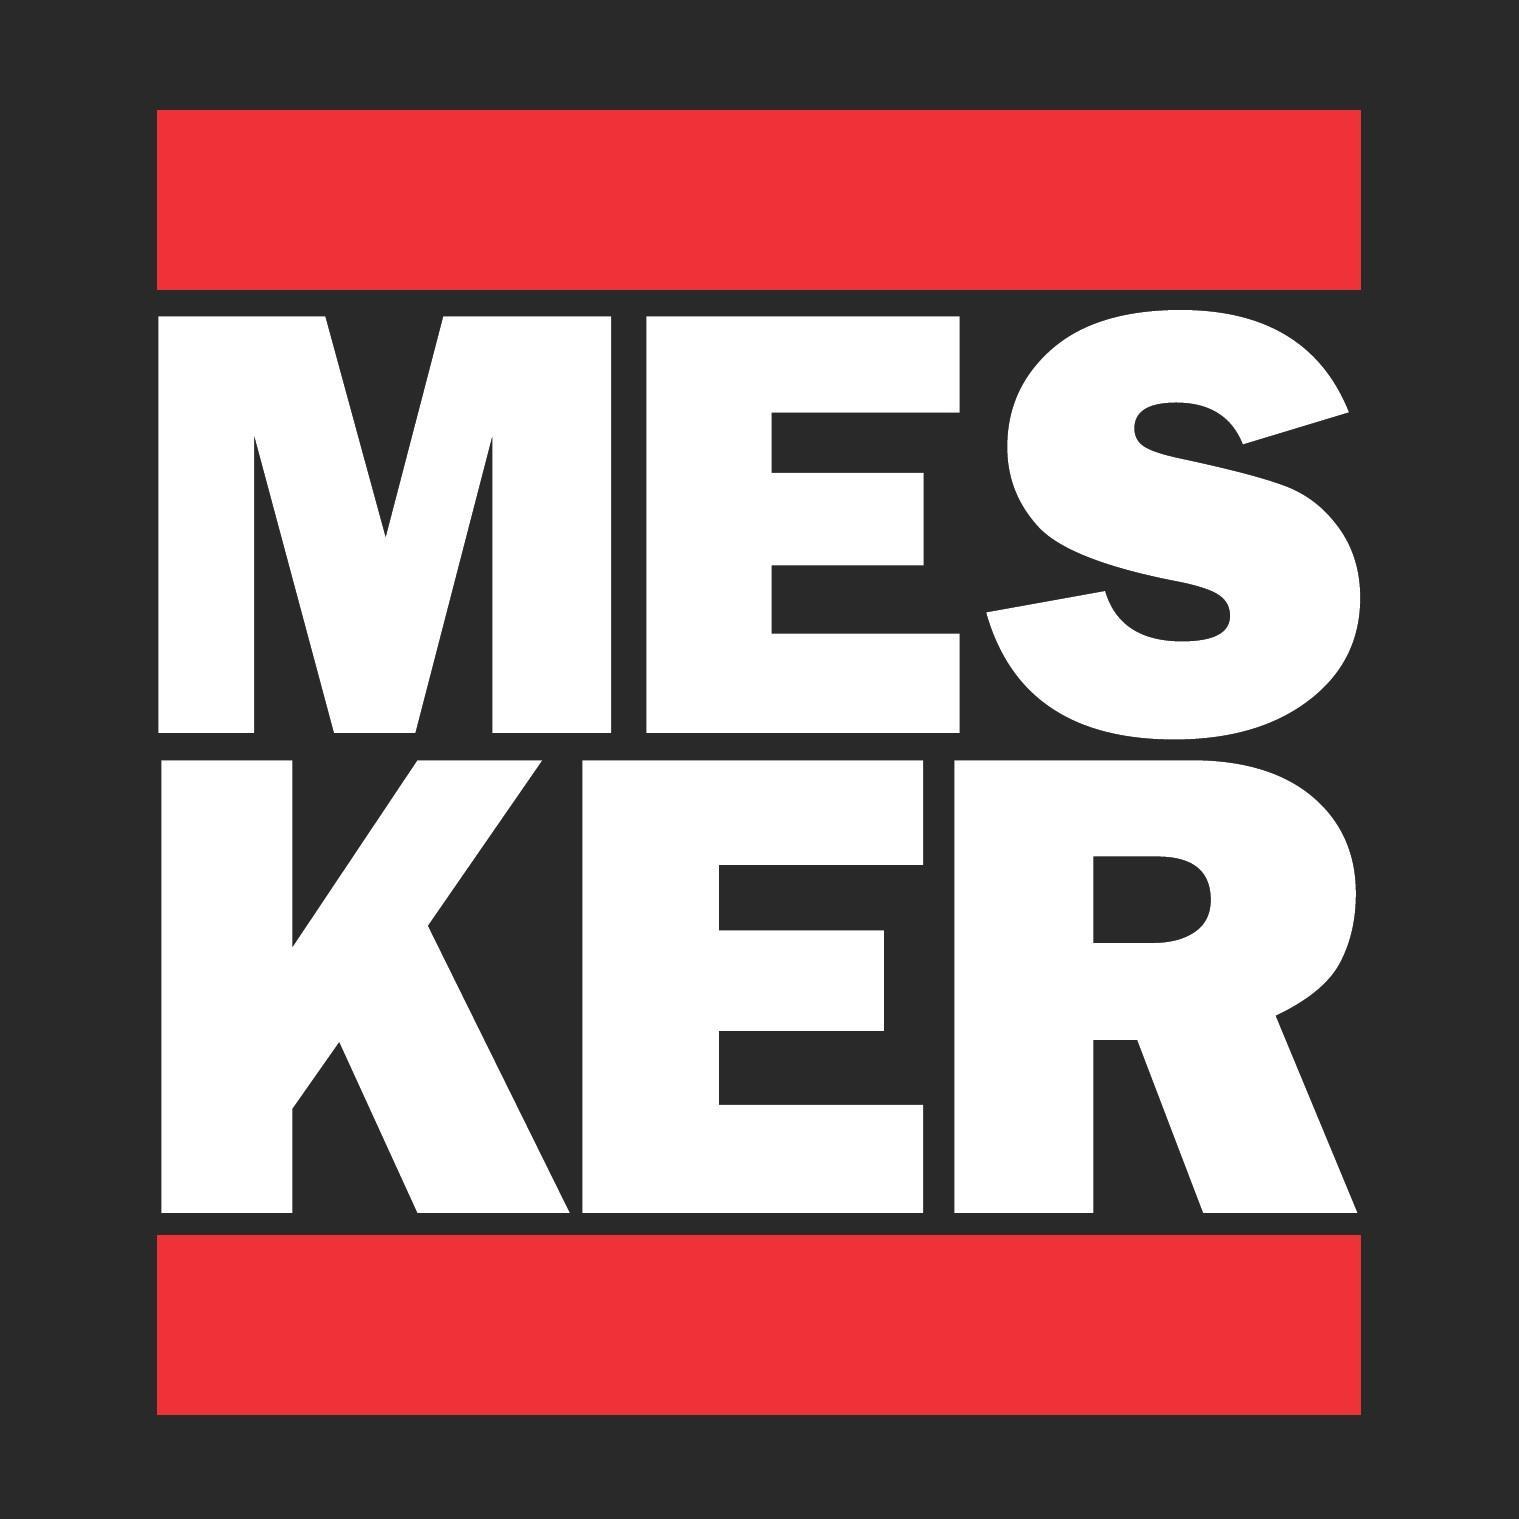 Nic Mesker - Photographer